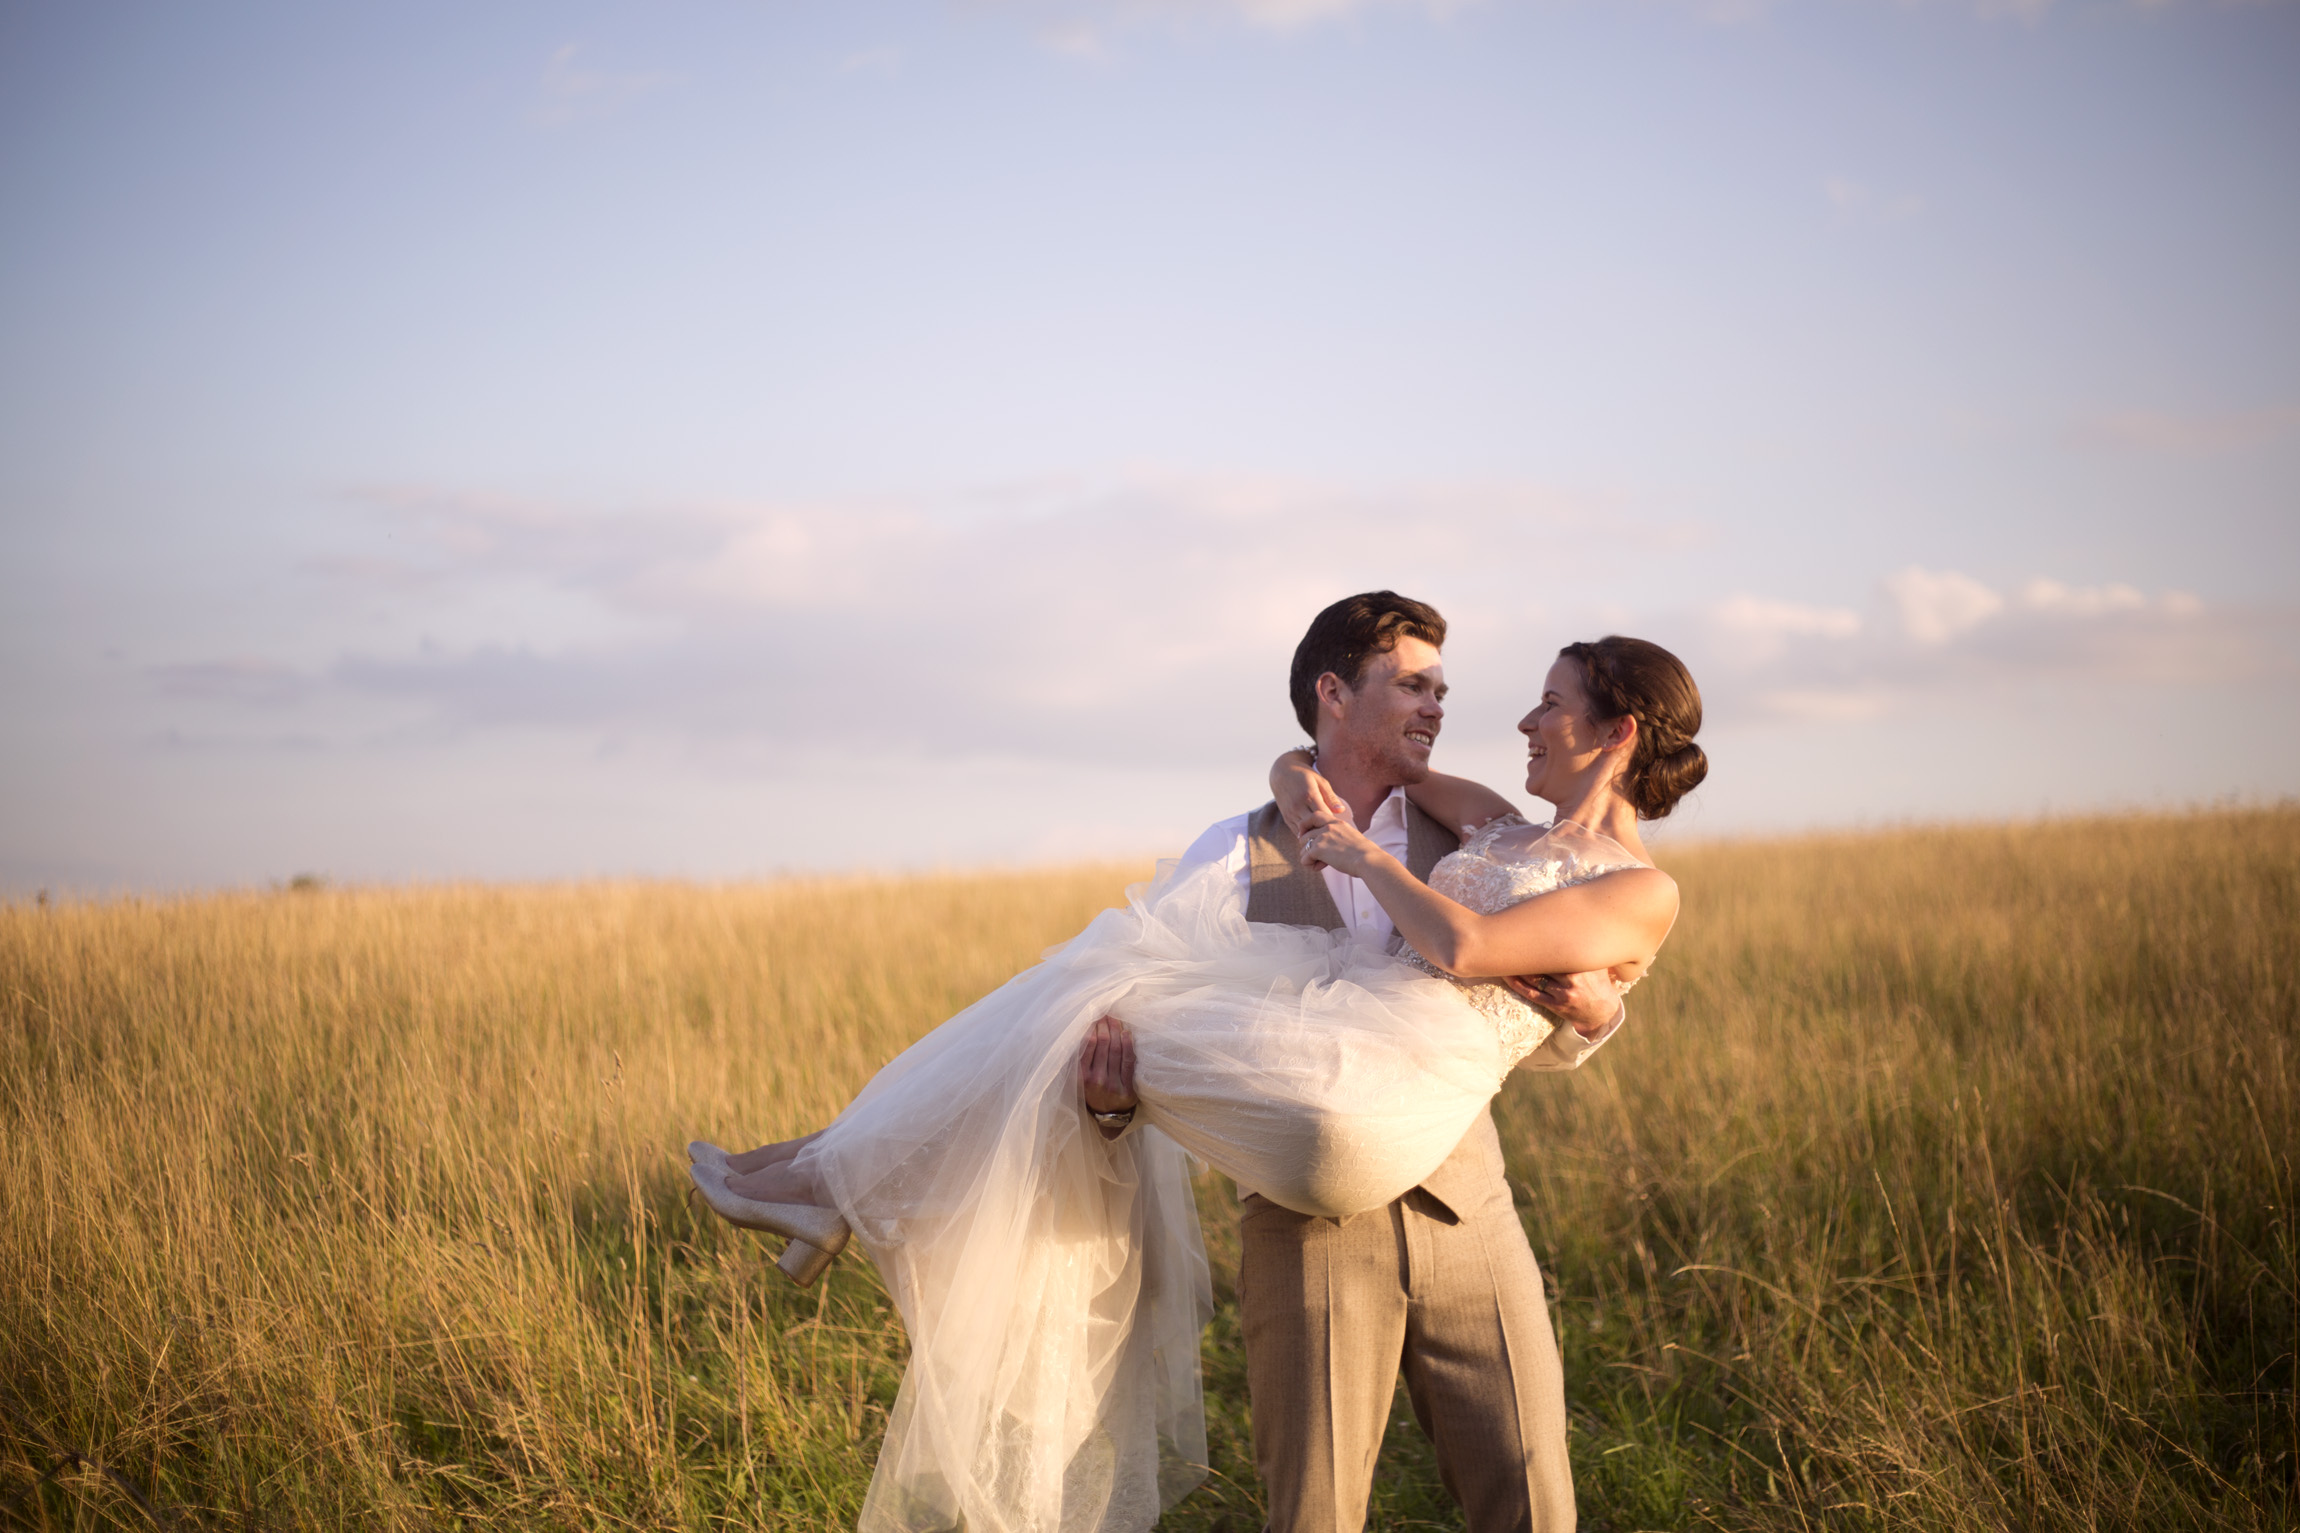 Groom picking up bride sunset golden hour Cripps barn outdoor wedding photographer